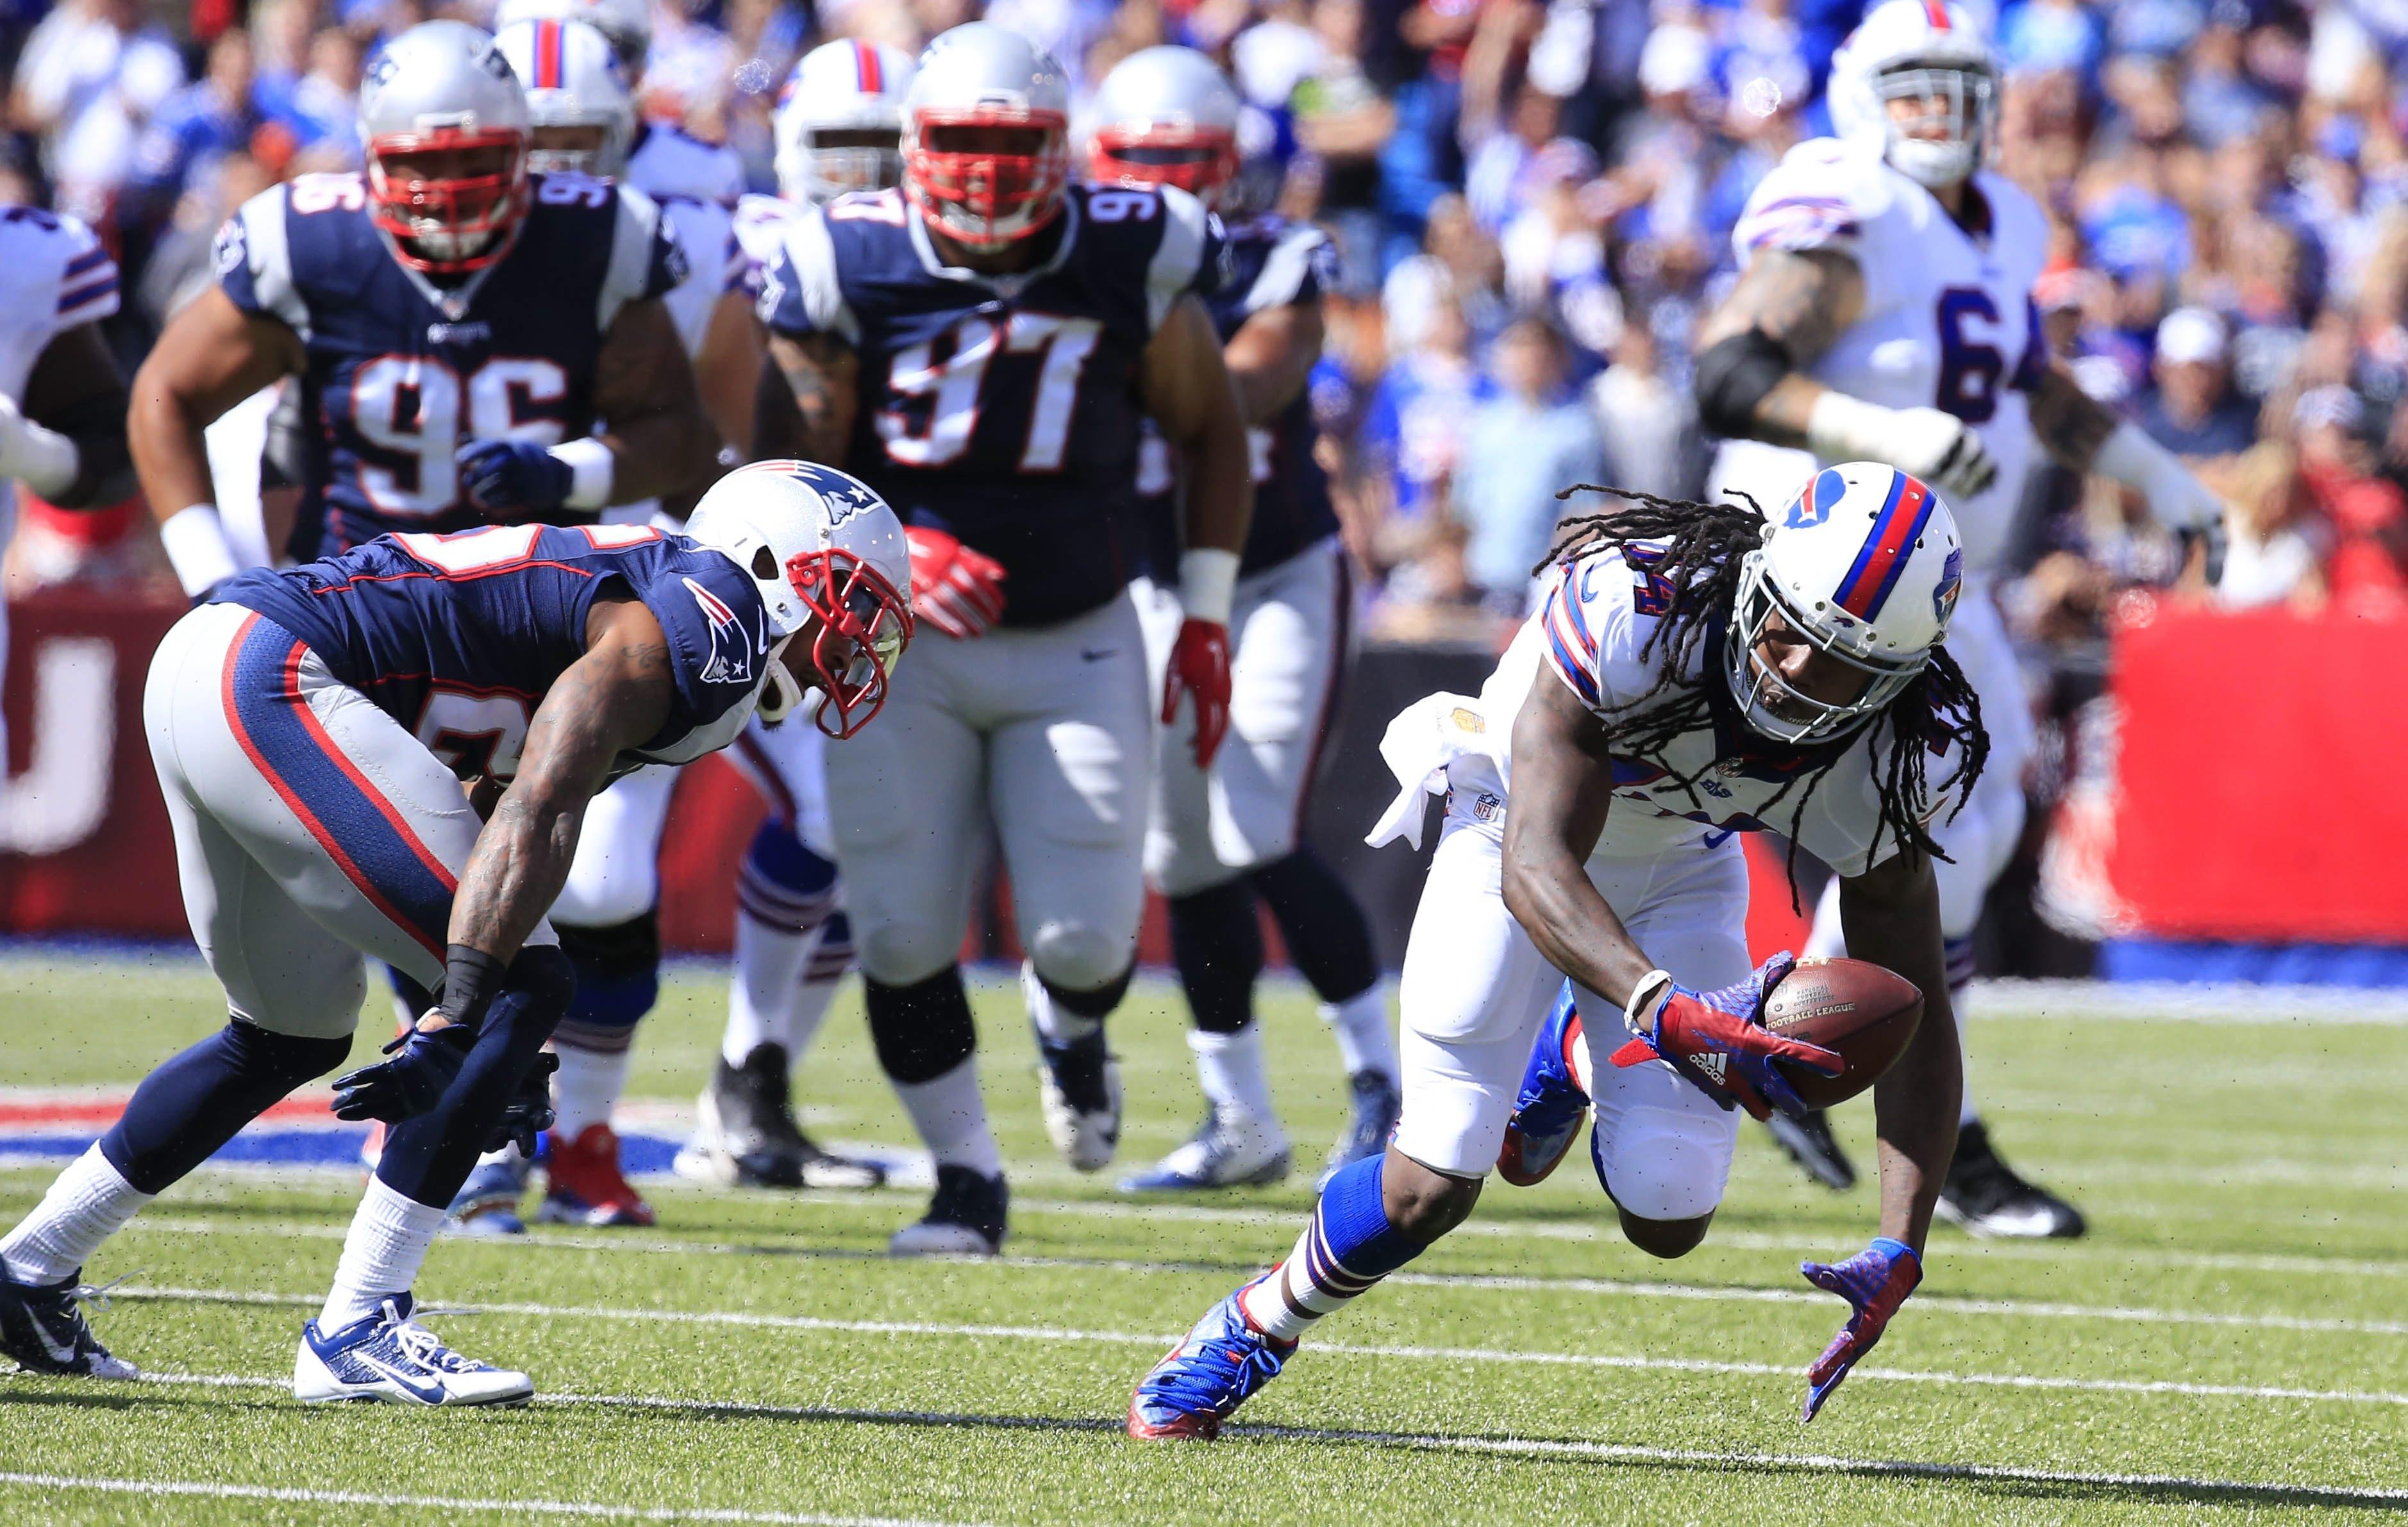 2LINE CUTLINE Buffalo Bills wide receiver Sammy Watkins picks up a pass against New England Patriots during the first quarter at Ralph Wilson Stadium on Sunday, Sept. 20, 2015. (Harry Scull Jr./Buffalo News)